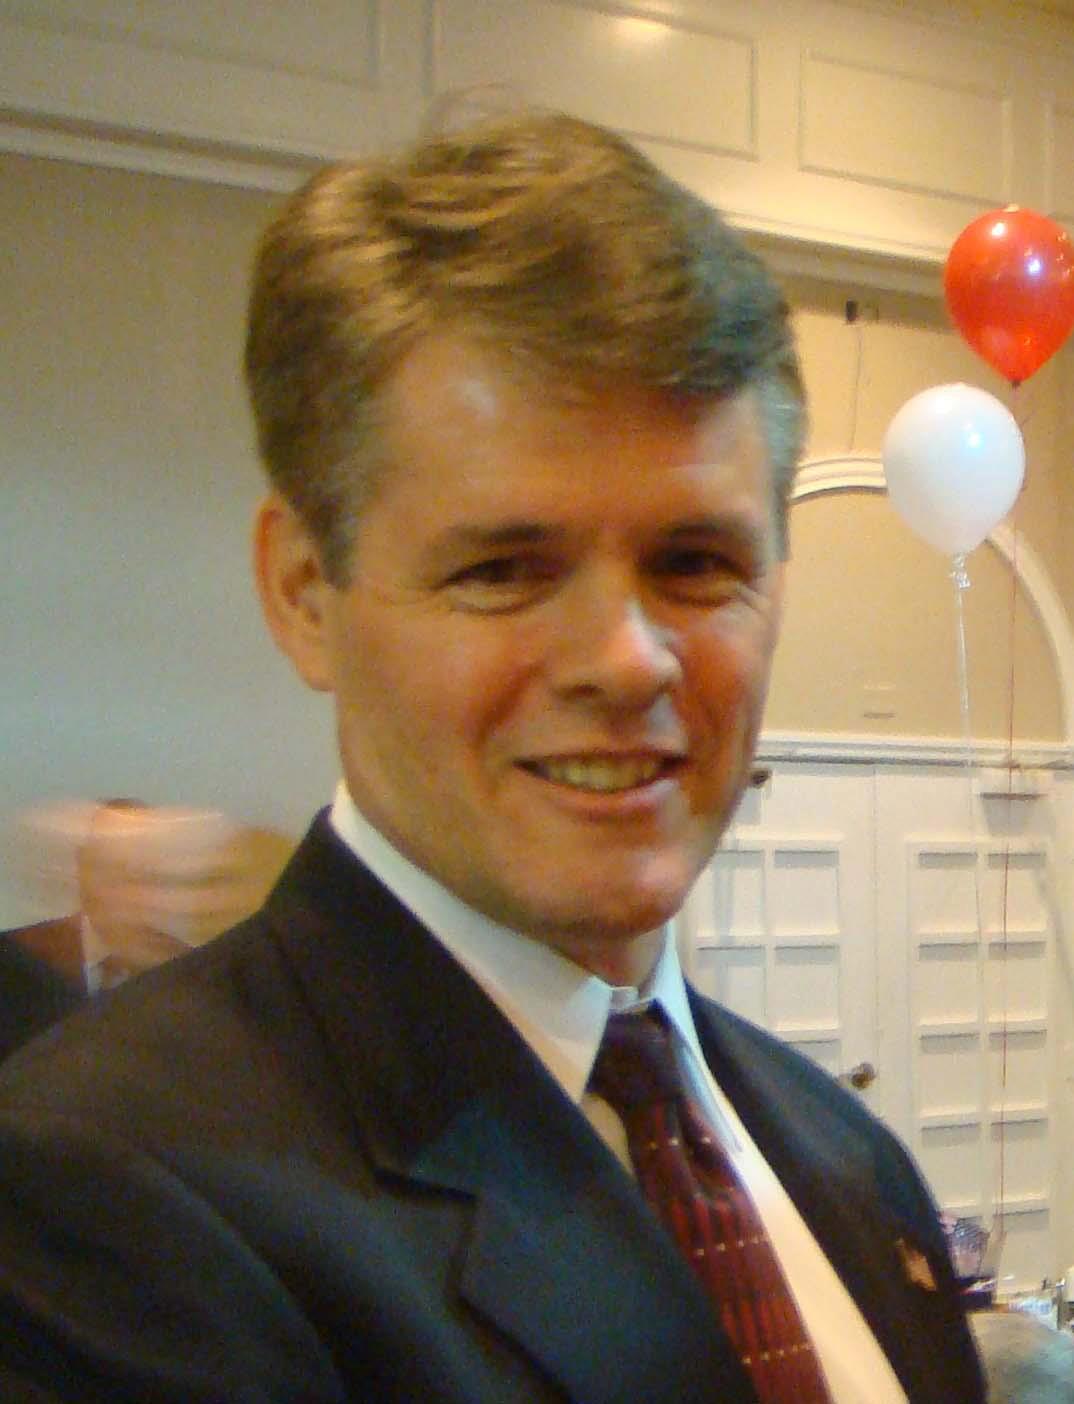 Assemblyman Edwards speaks against recreational marijuana